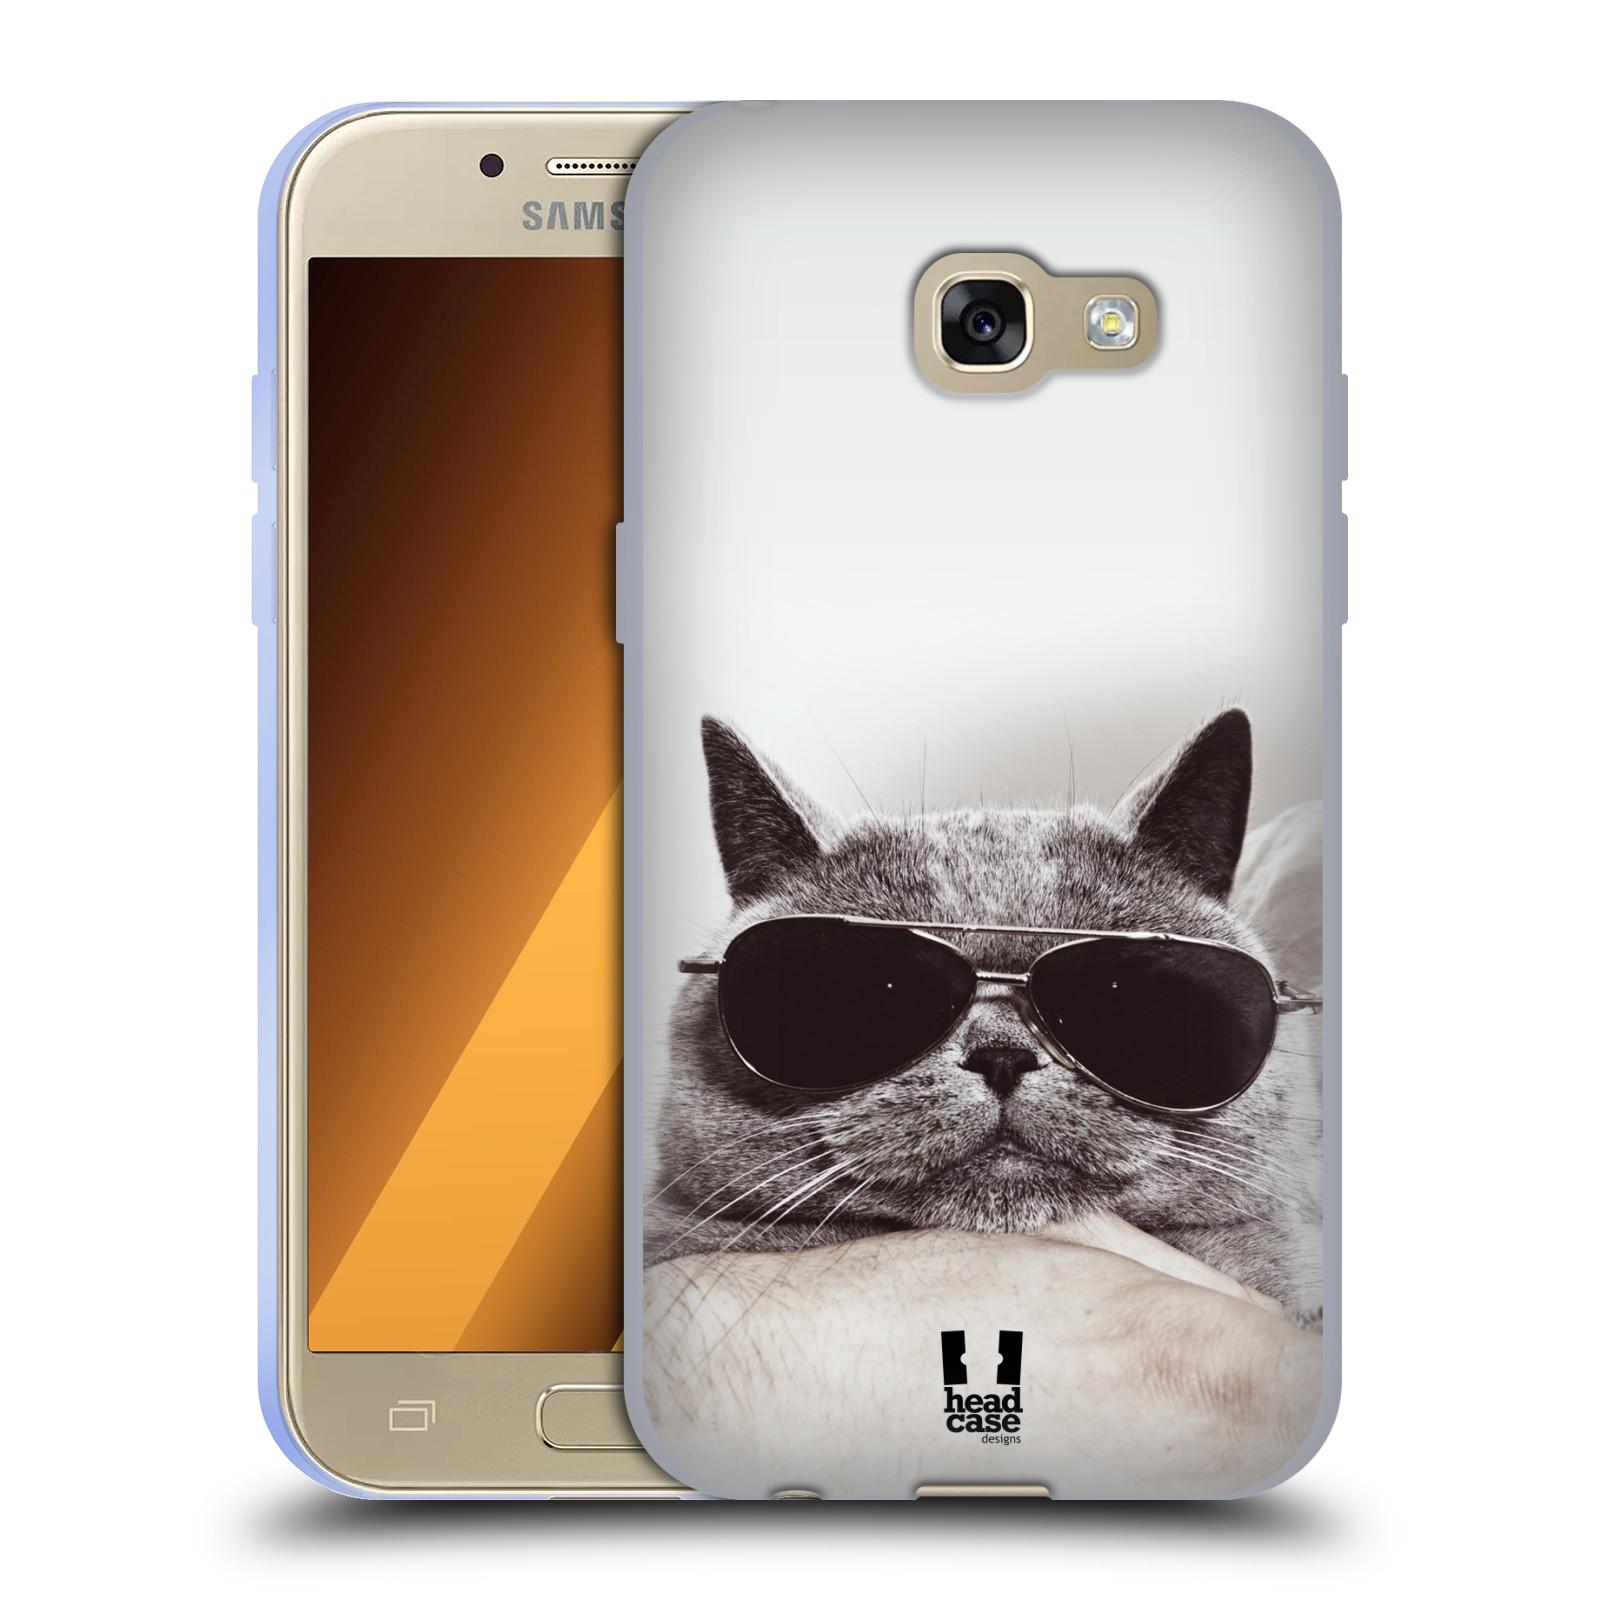 Silikonové pouzdro na mobil Samsung Galaxy A3 (2017) HEAD CASE KOTĚ S BRÝLEMI (Silikonový kryt či obal na mobilní telefon Samsung Galaxy A3 2017 SM-A320)